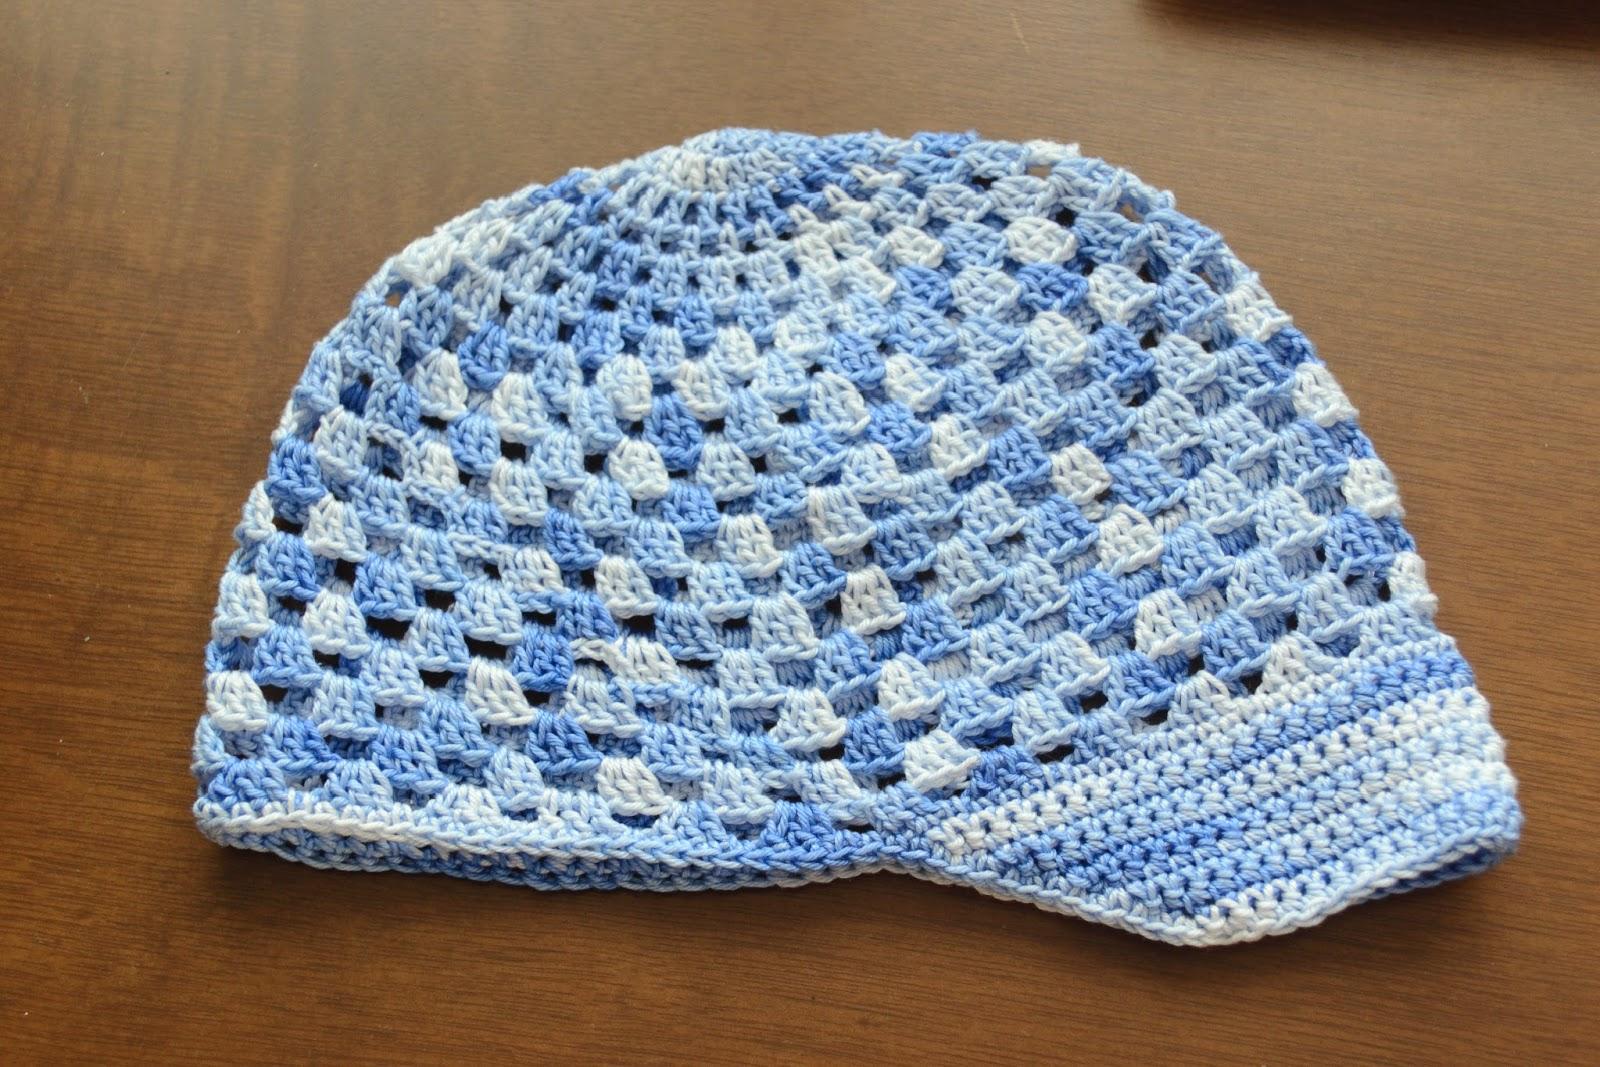 d0b5b4e2a9a Selle sinise mütsi mustri sain raamatust :